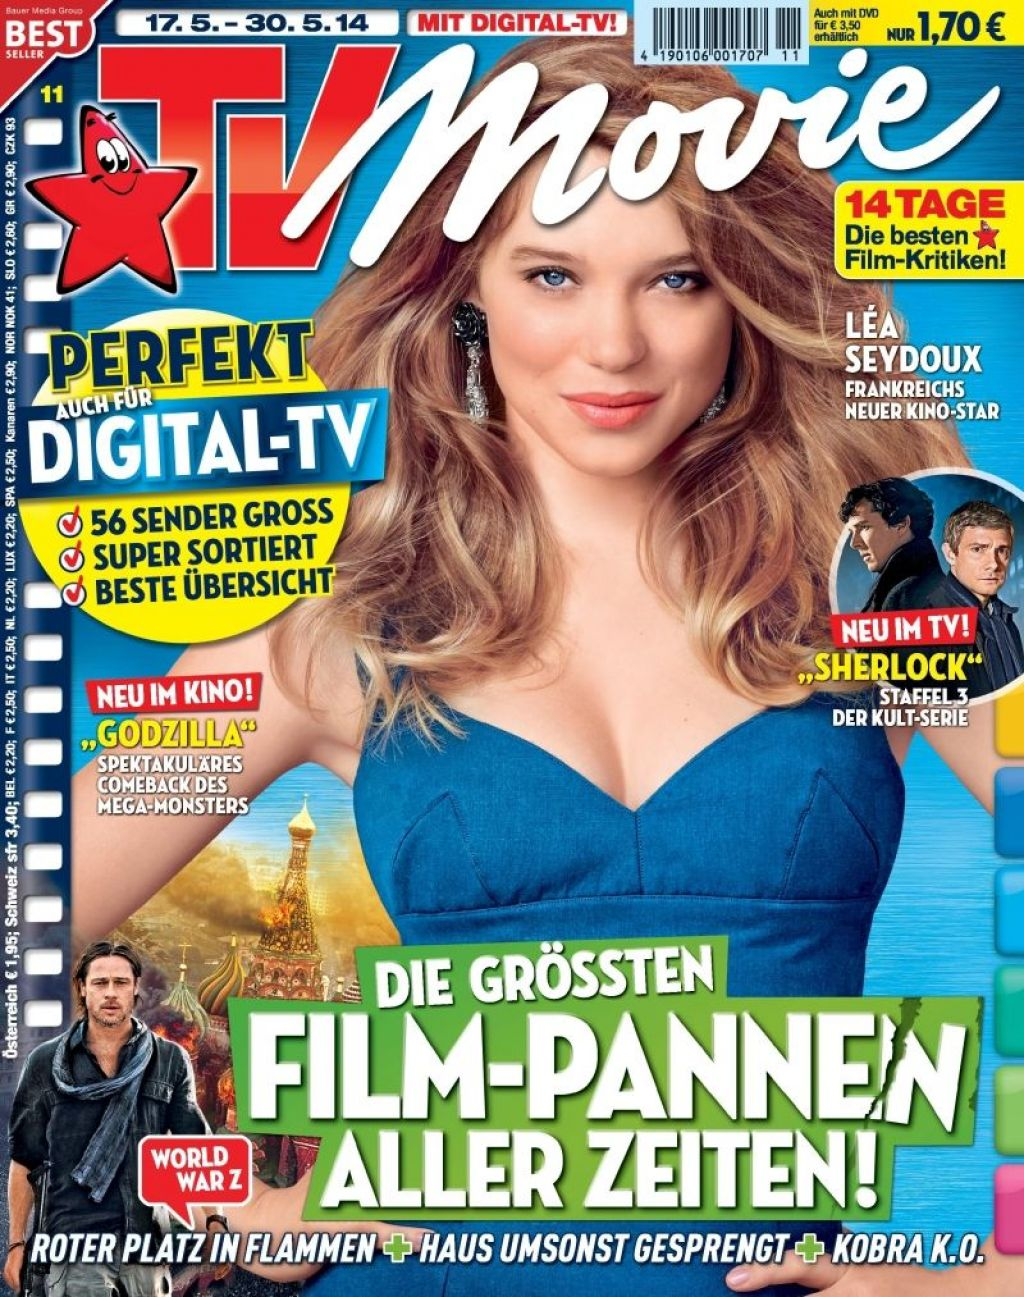 Lea Seydoux - TV Movie Magazine May 2014 Issue